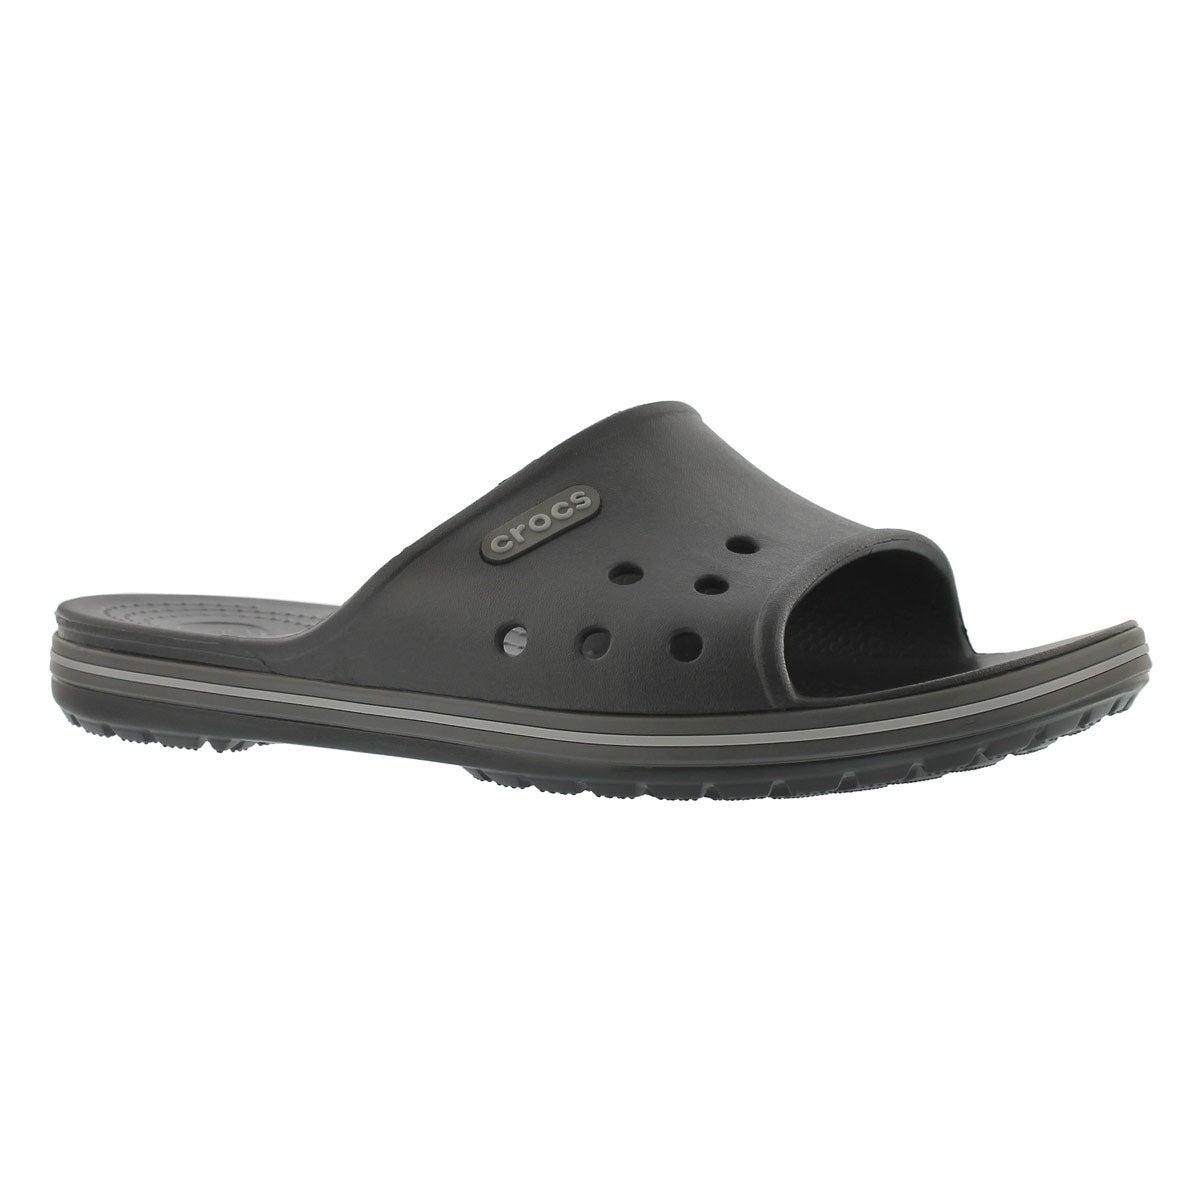 Men's CROCBAND II black/graphite sandals